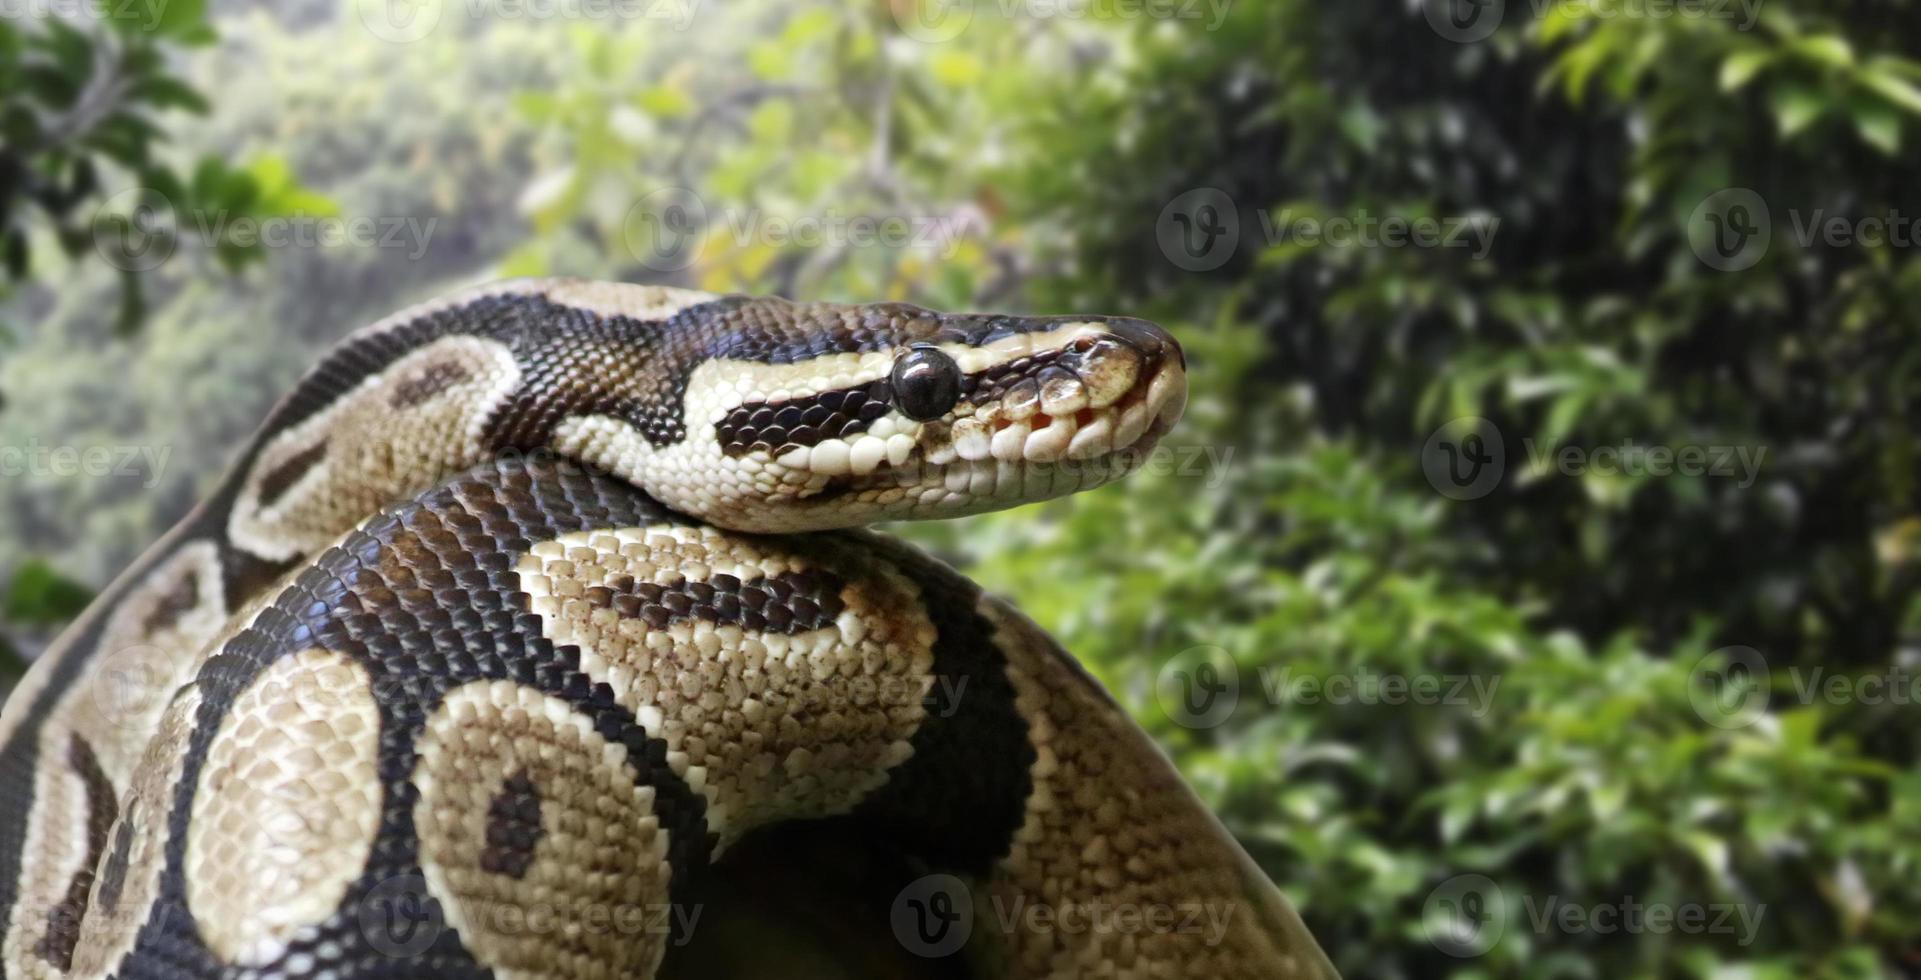 Close-up view of a royal python photo